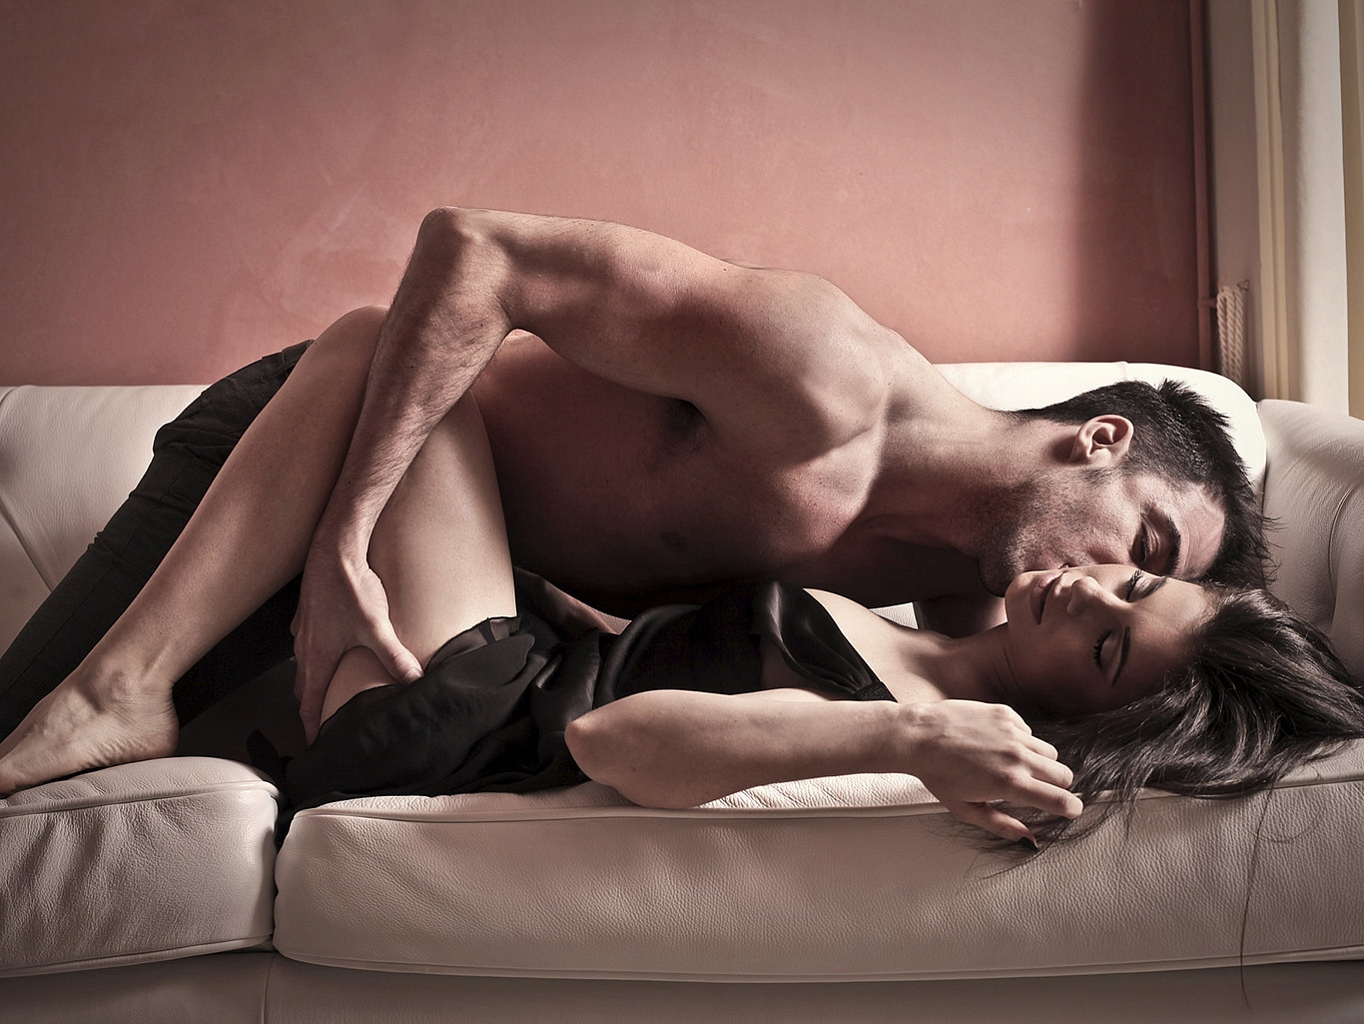 Erotic office romance